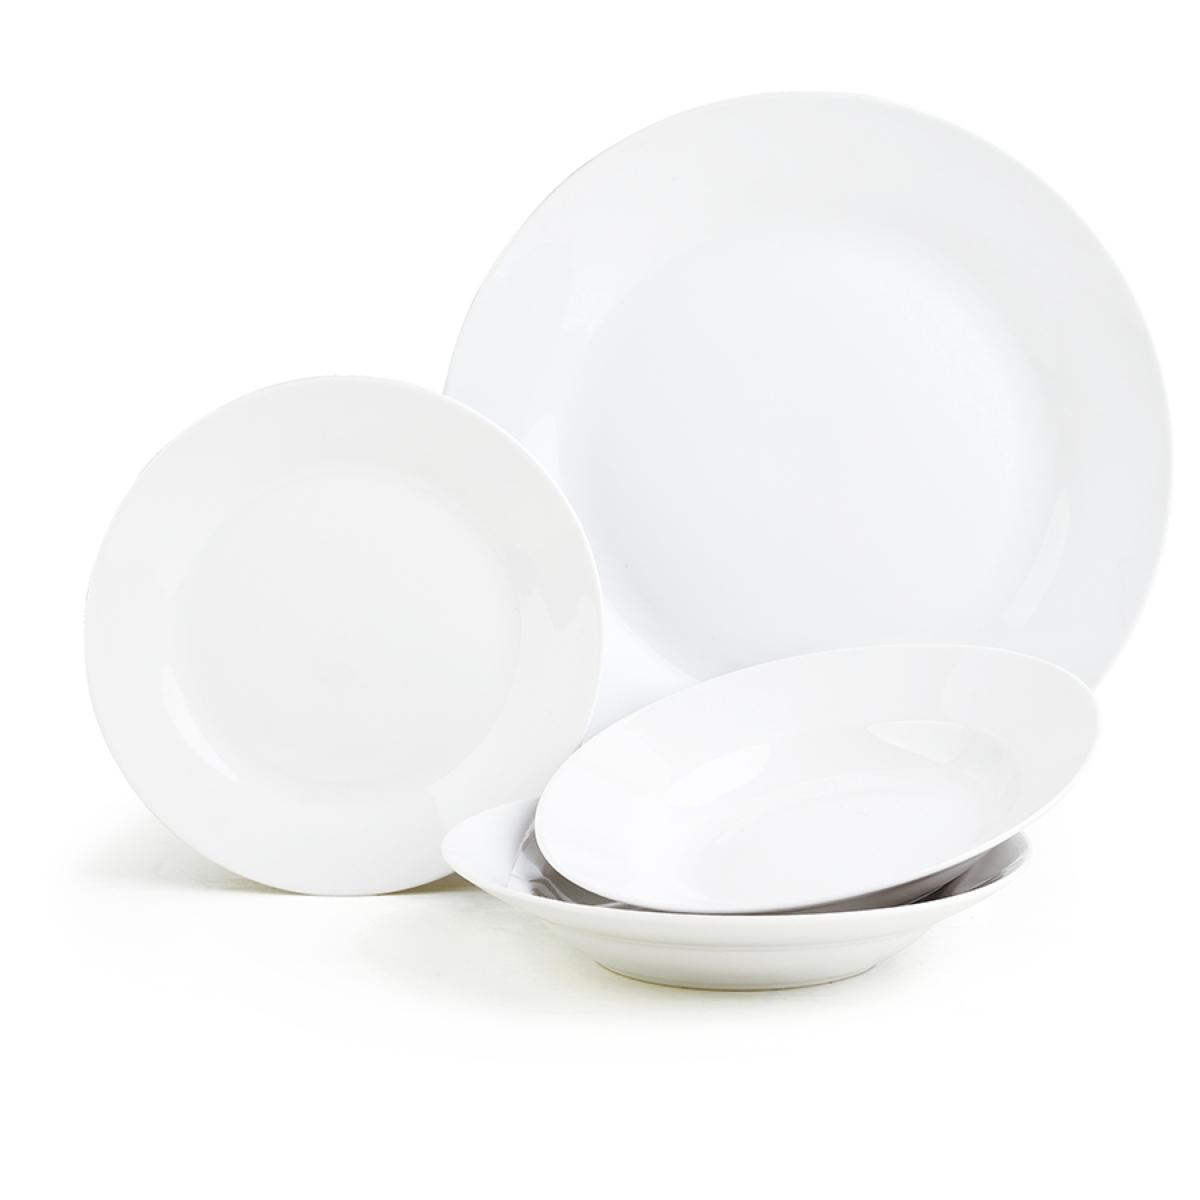 Sabichi 12-Piece White Everyday Porcelain Dinner Set